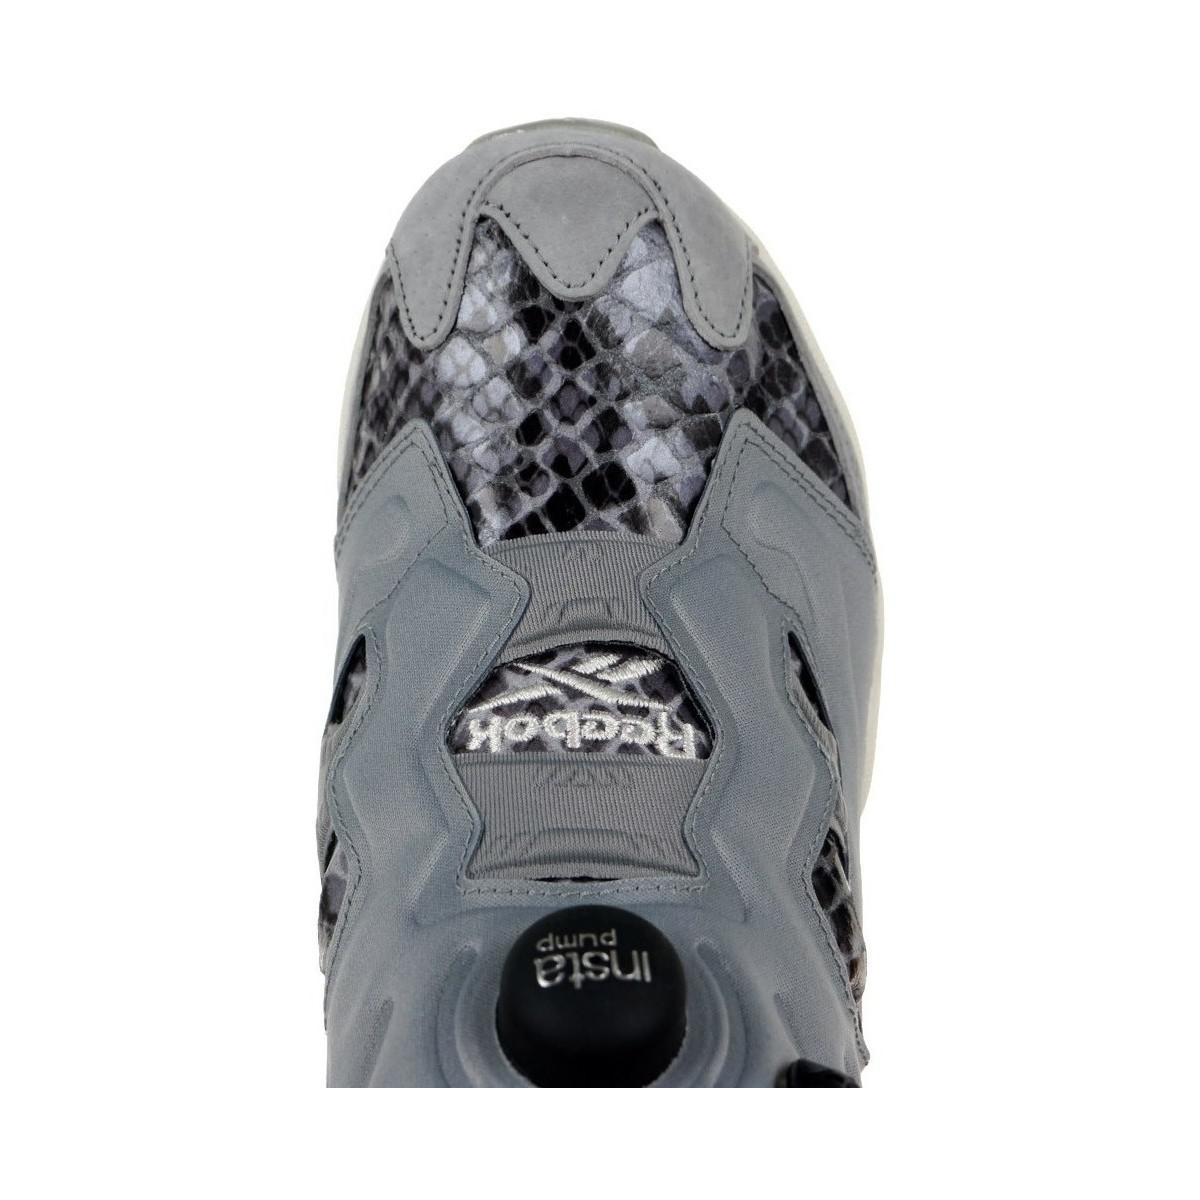 b566136e Reebok Classic Instapump Fury Disney Jungle Book Women's Shoes ...